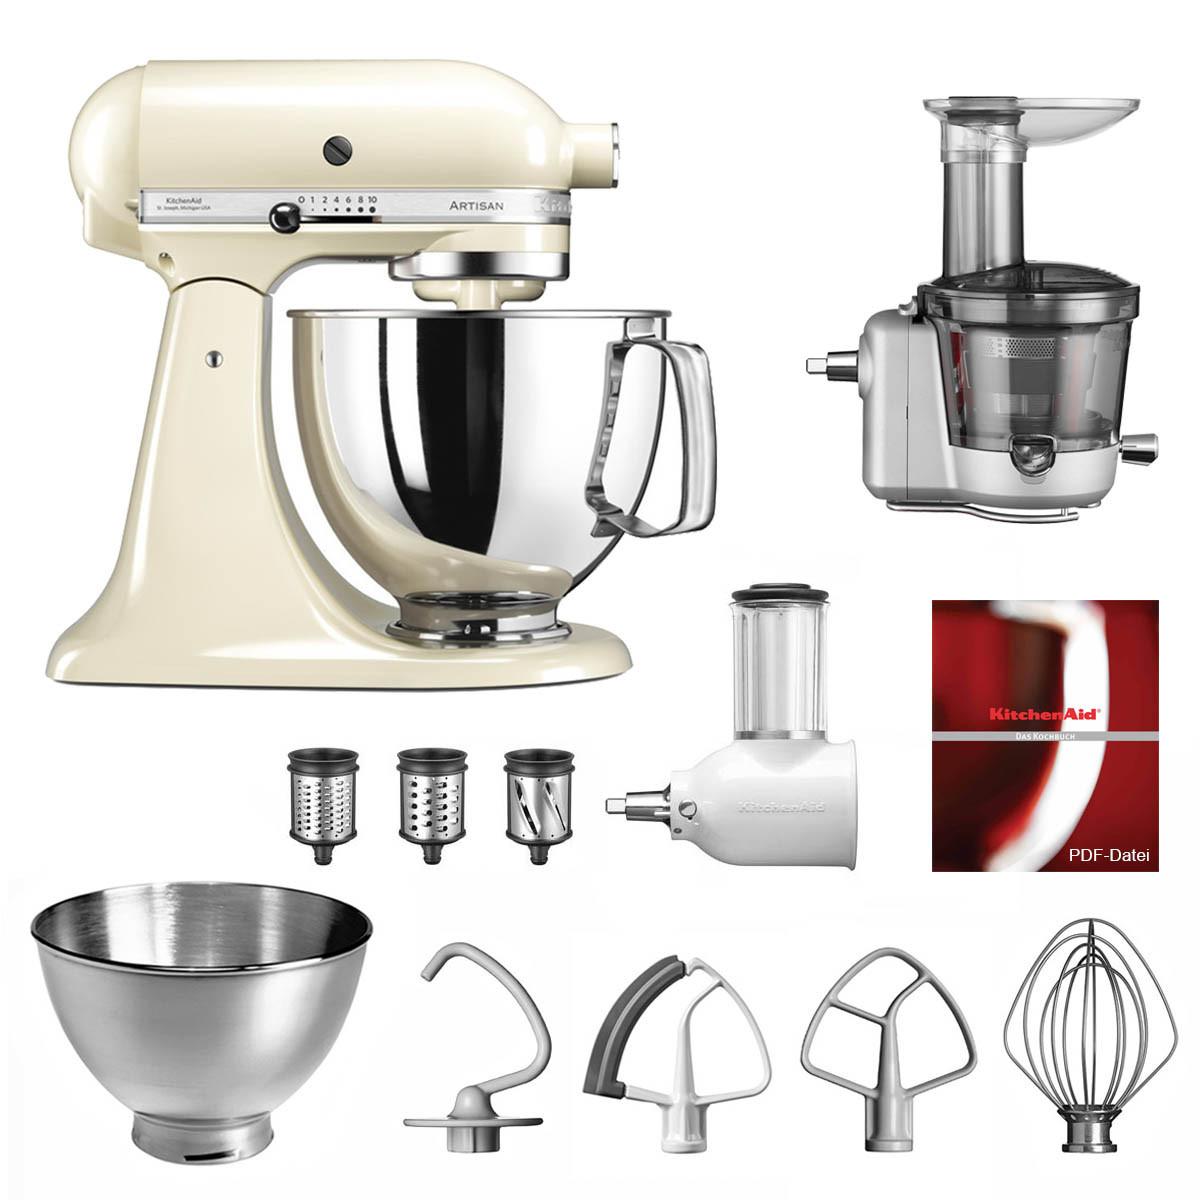 KitchenAid Küchenmaschine 175PS Entsafter Vital-Set creme/mandel